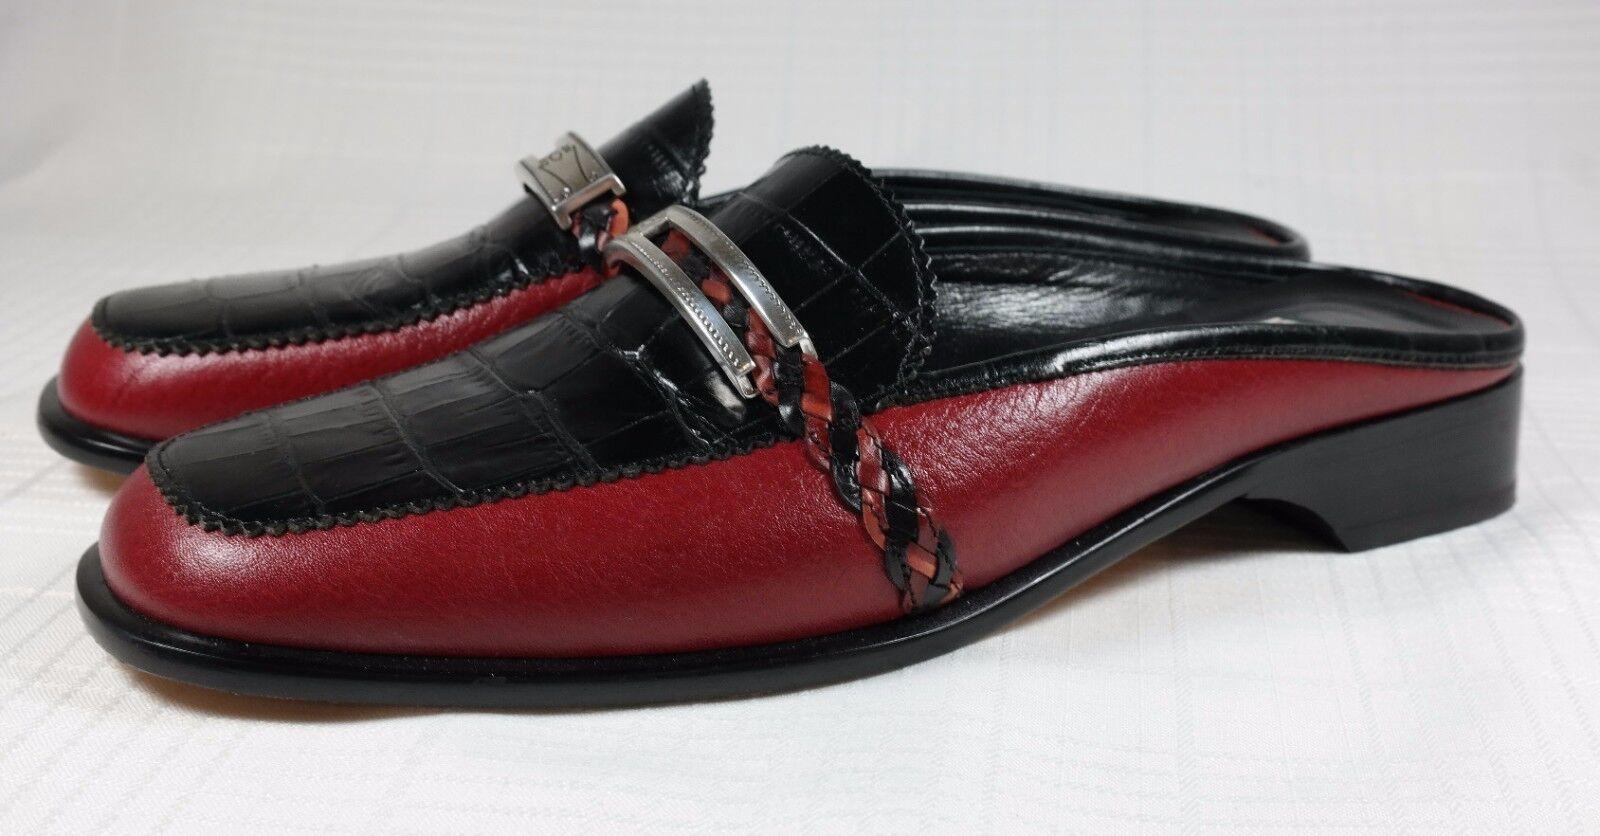 BRIGHTON JODI 7.5 M rouge Croc Embossed Leather Sandals chaussures Slide Clogs